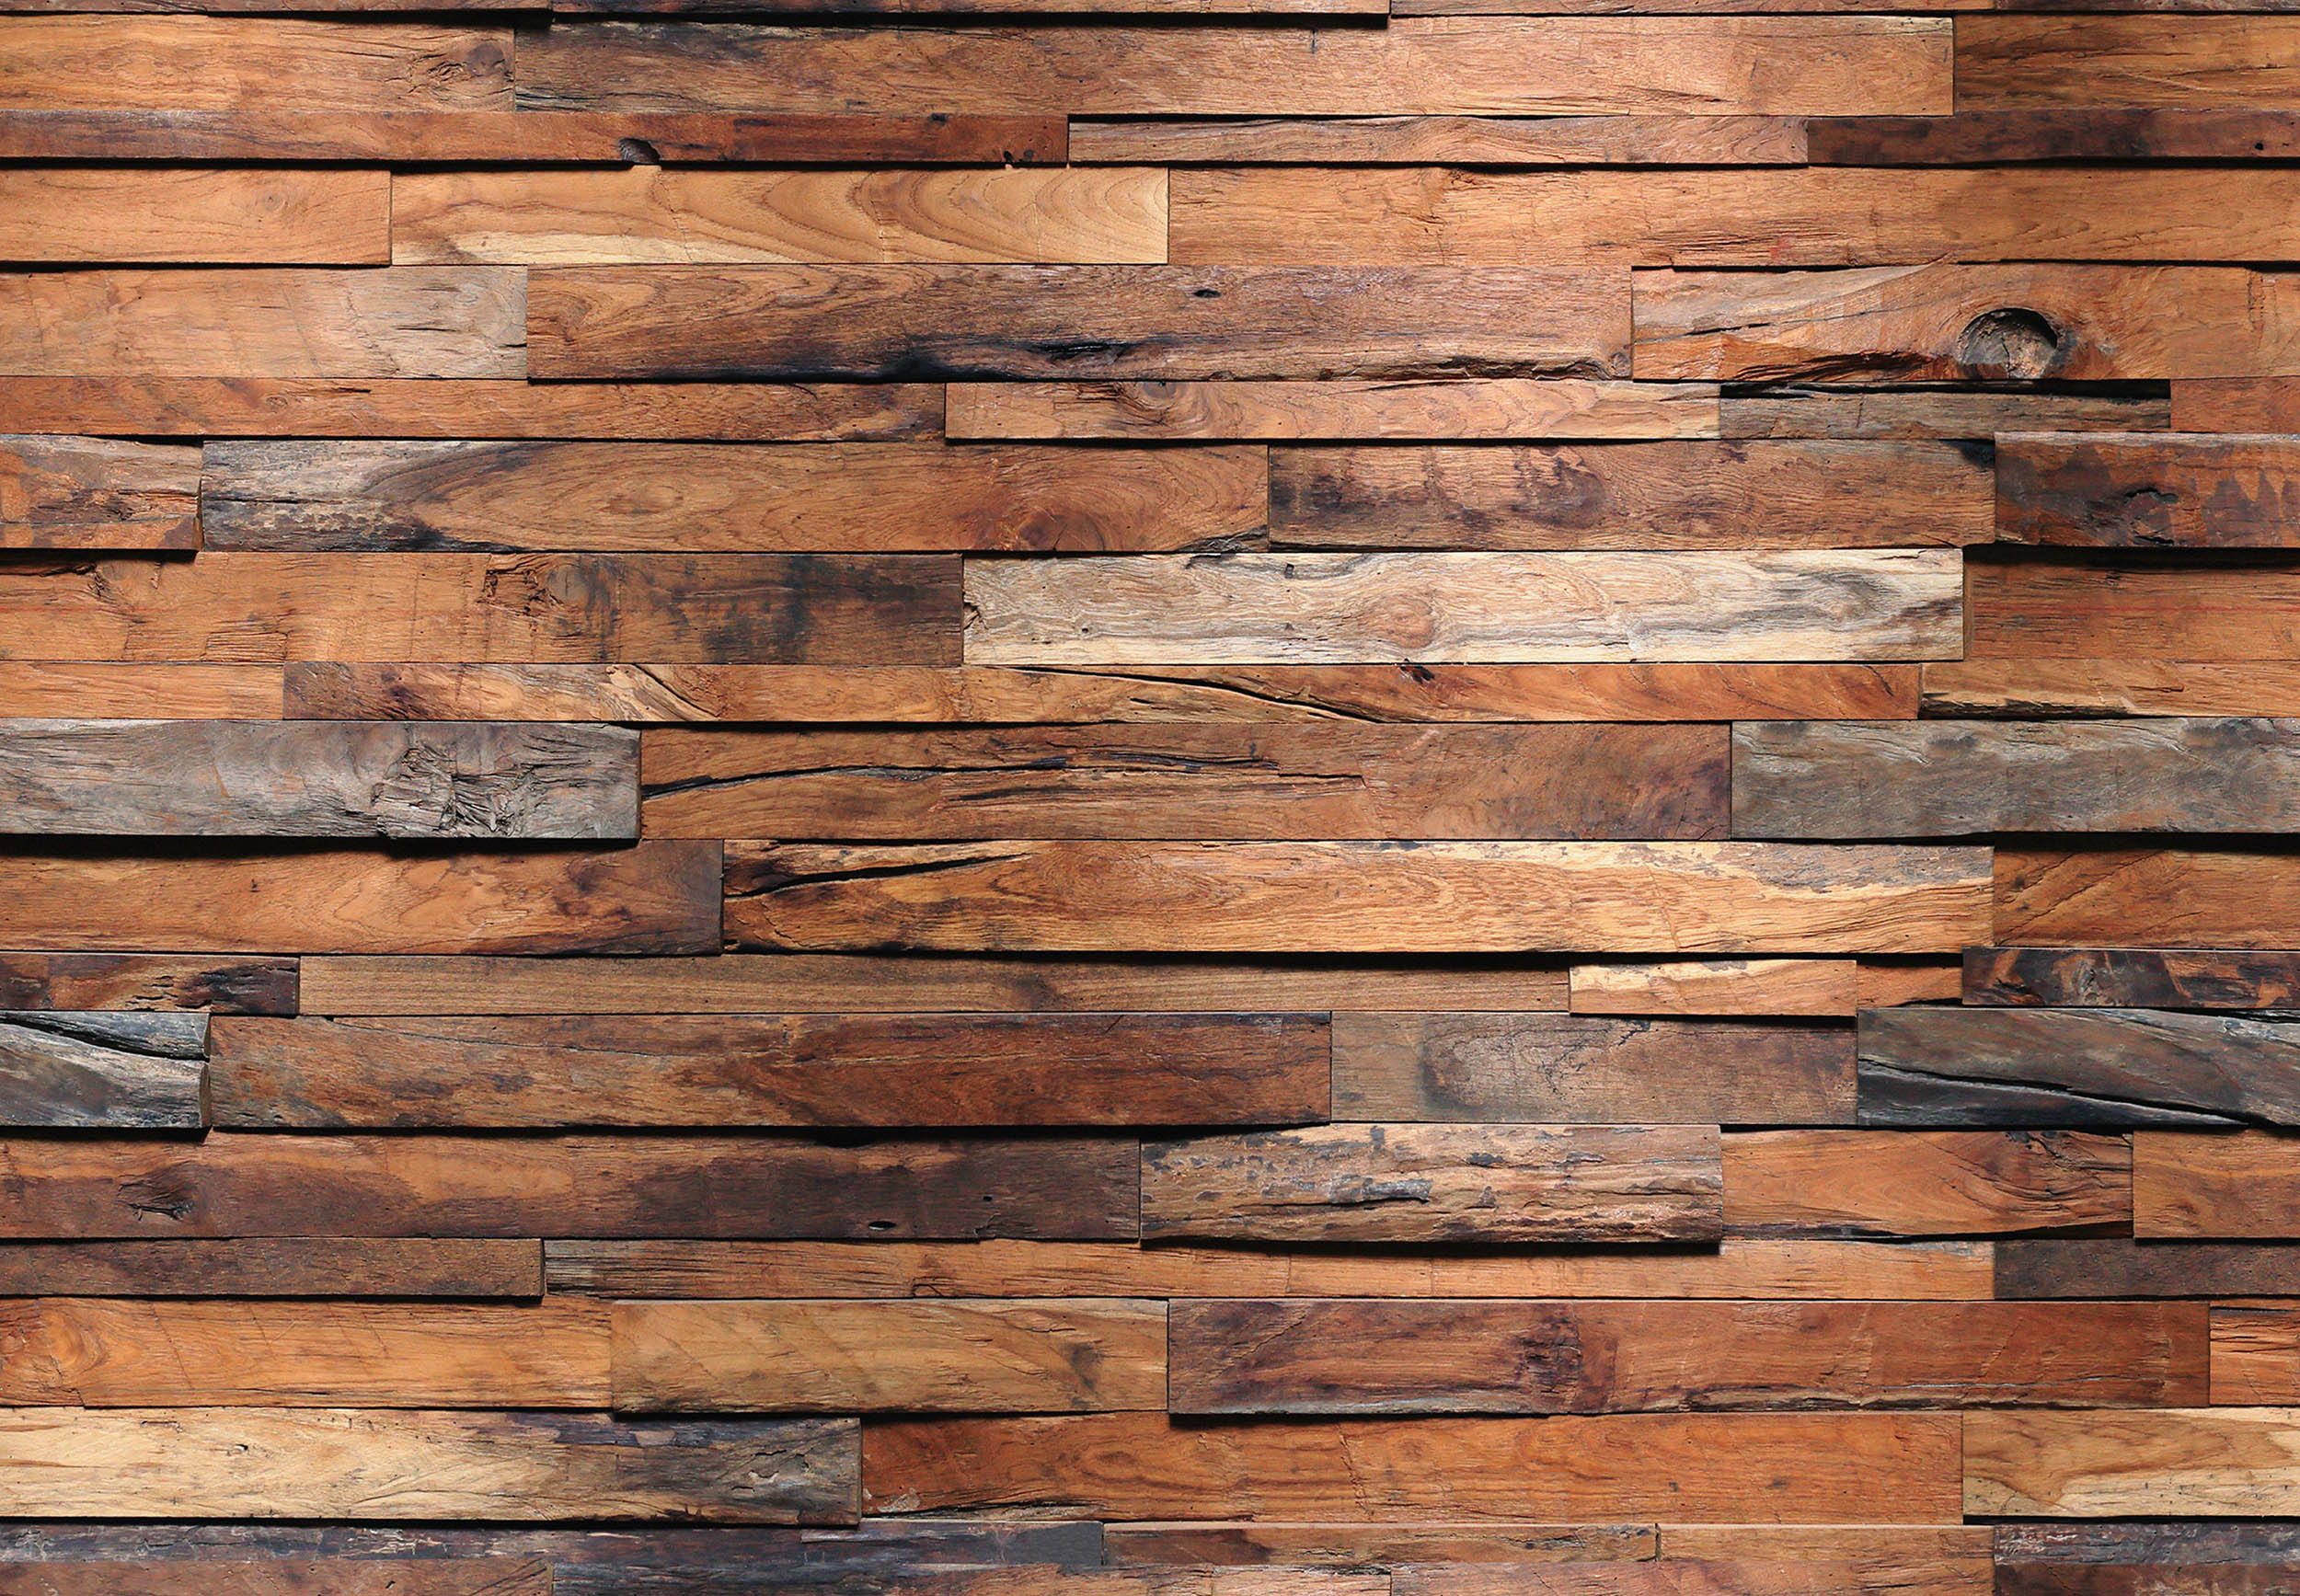 Fototapete wooden wall 366 x 254cm bretterwand holz rustikal 8 teilg ebay - Holzwand rustikal ...